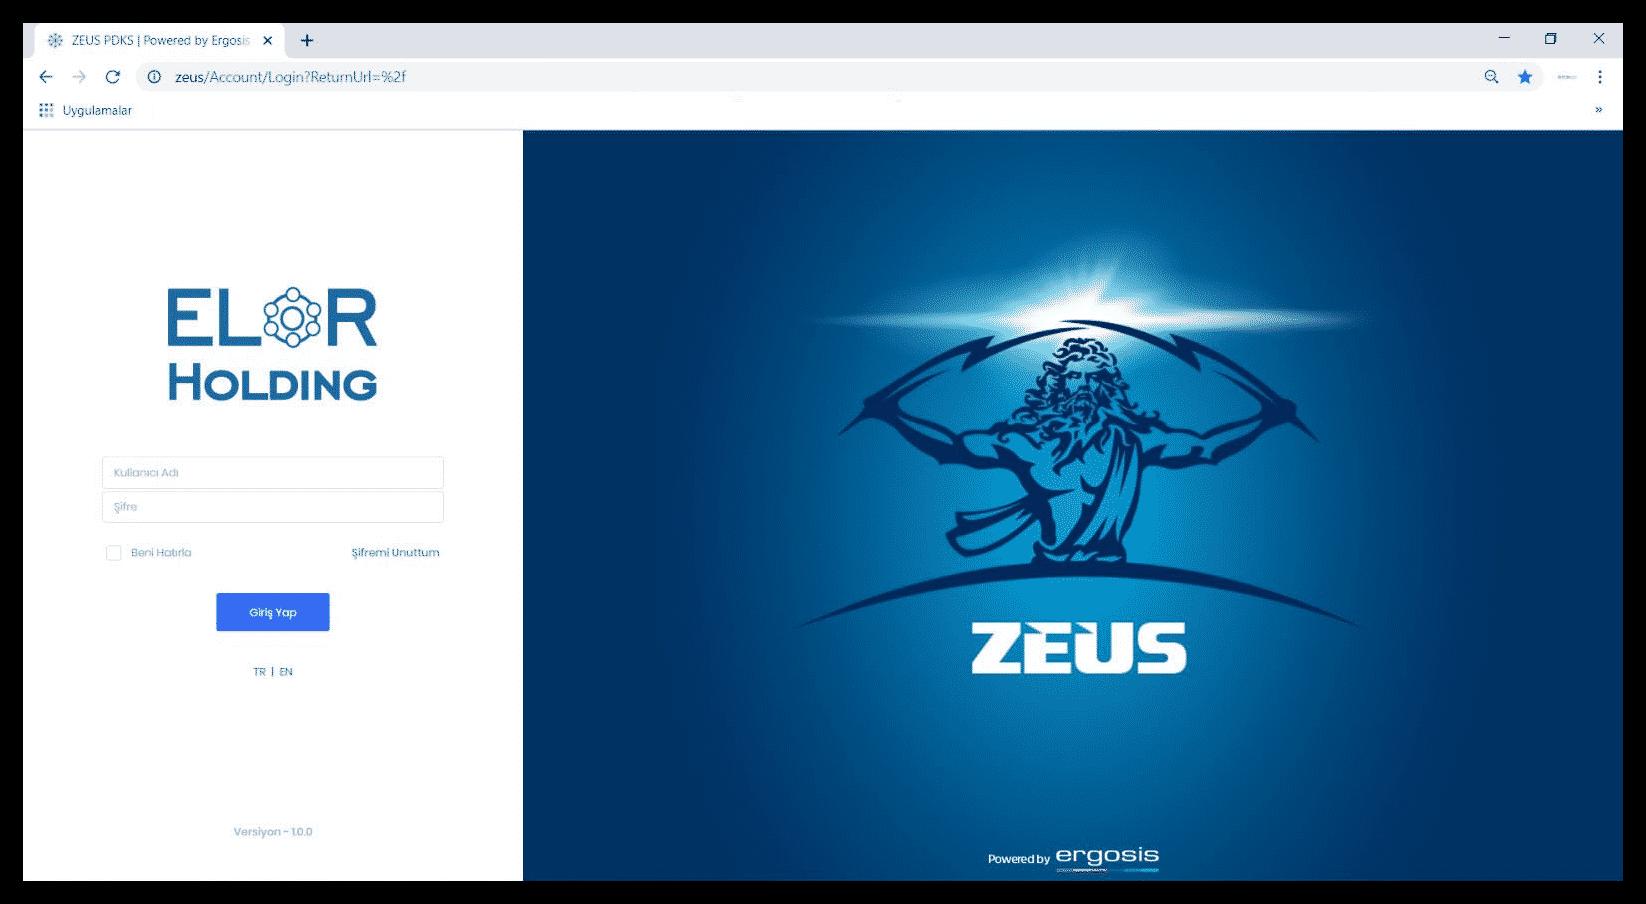 PDKS-Zeus